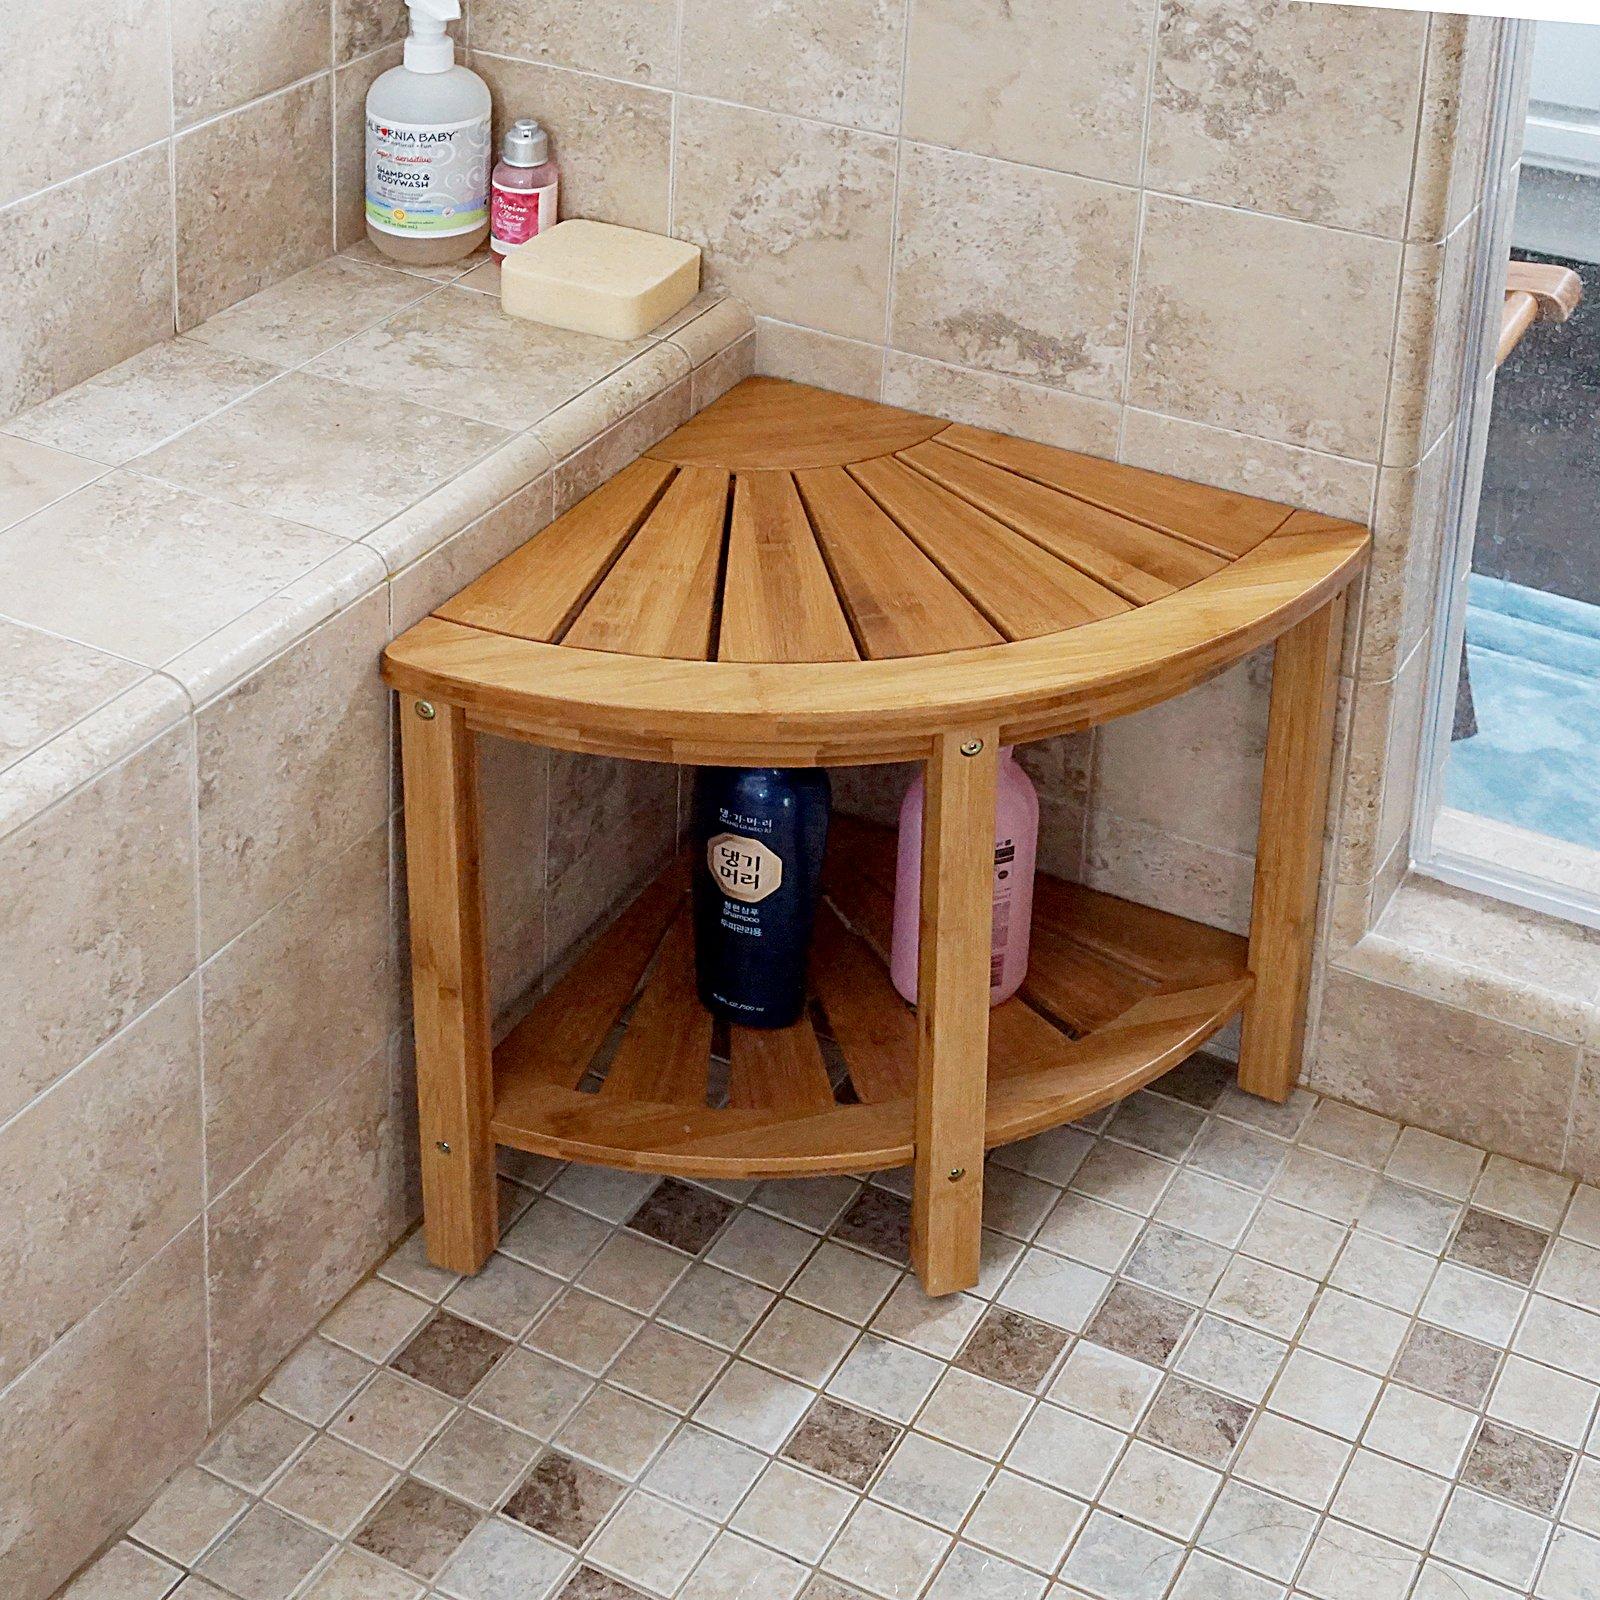 WELLAND Bamboo Corner Shower Bench/Stool Steat With Storage Shelf